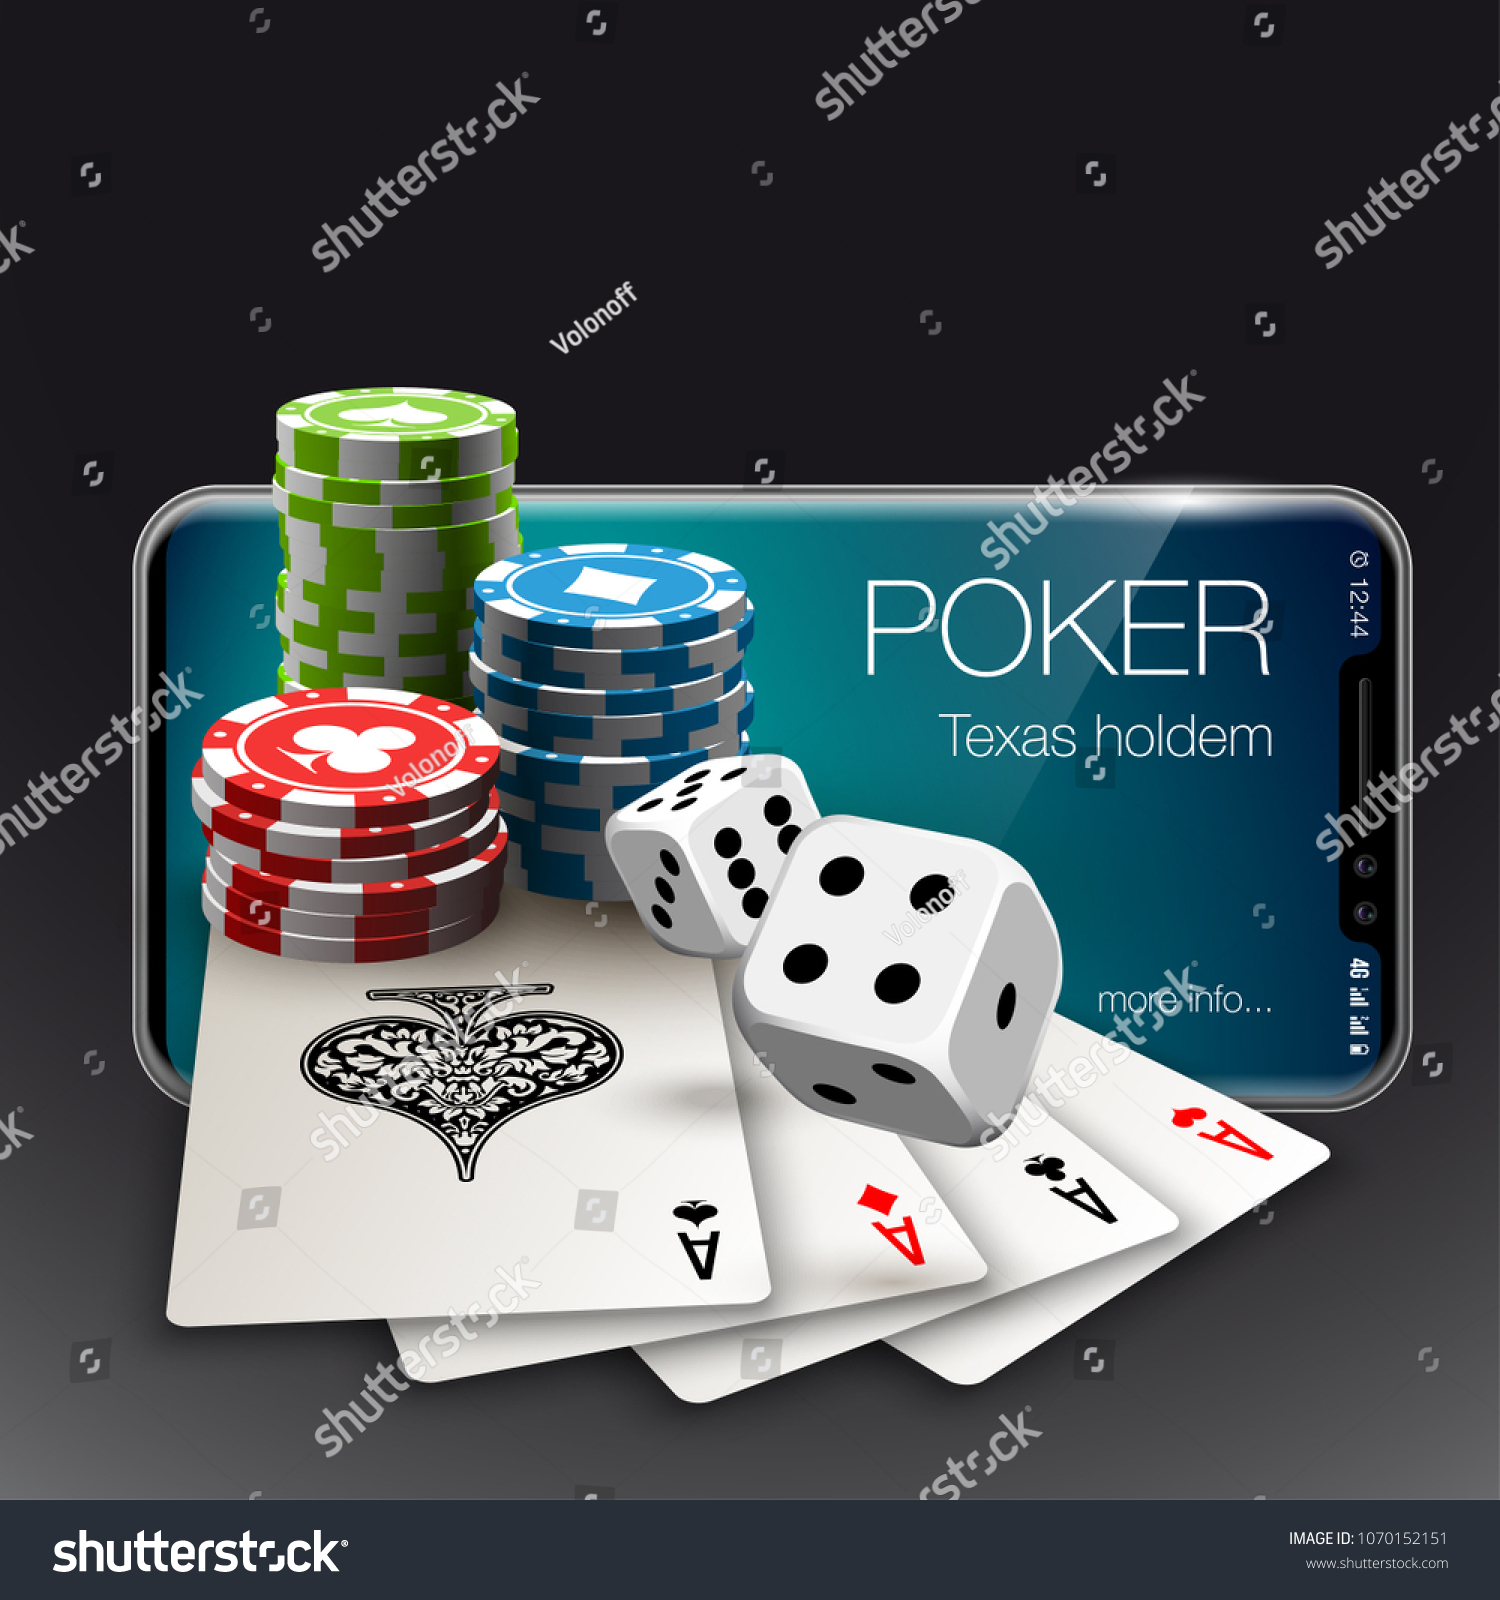 Biggest online casino welcome bonus', The club online casino